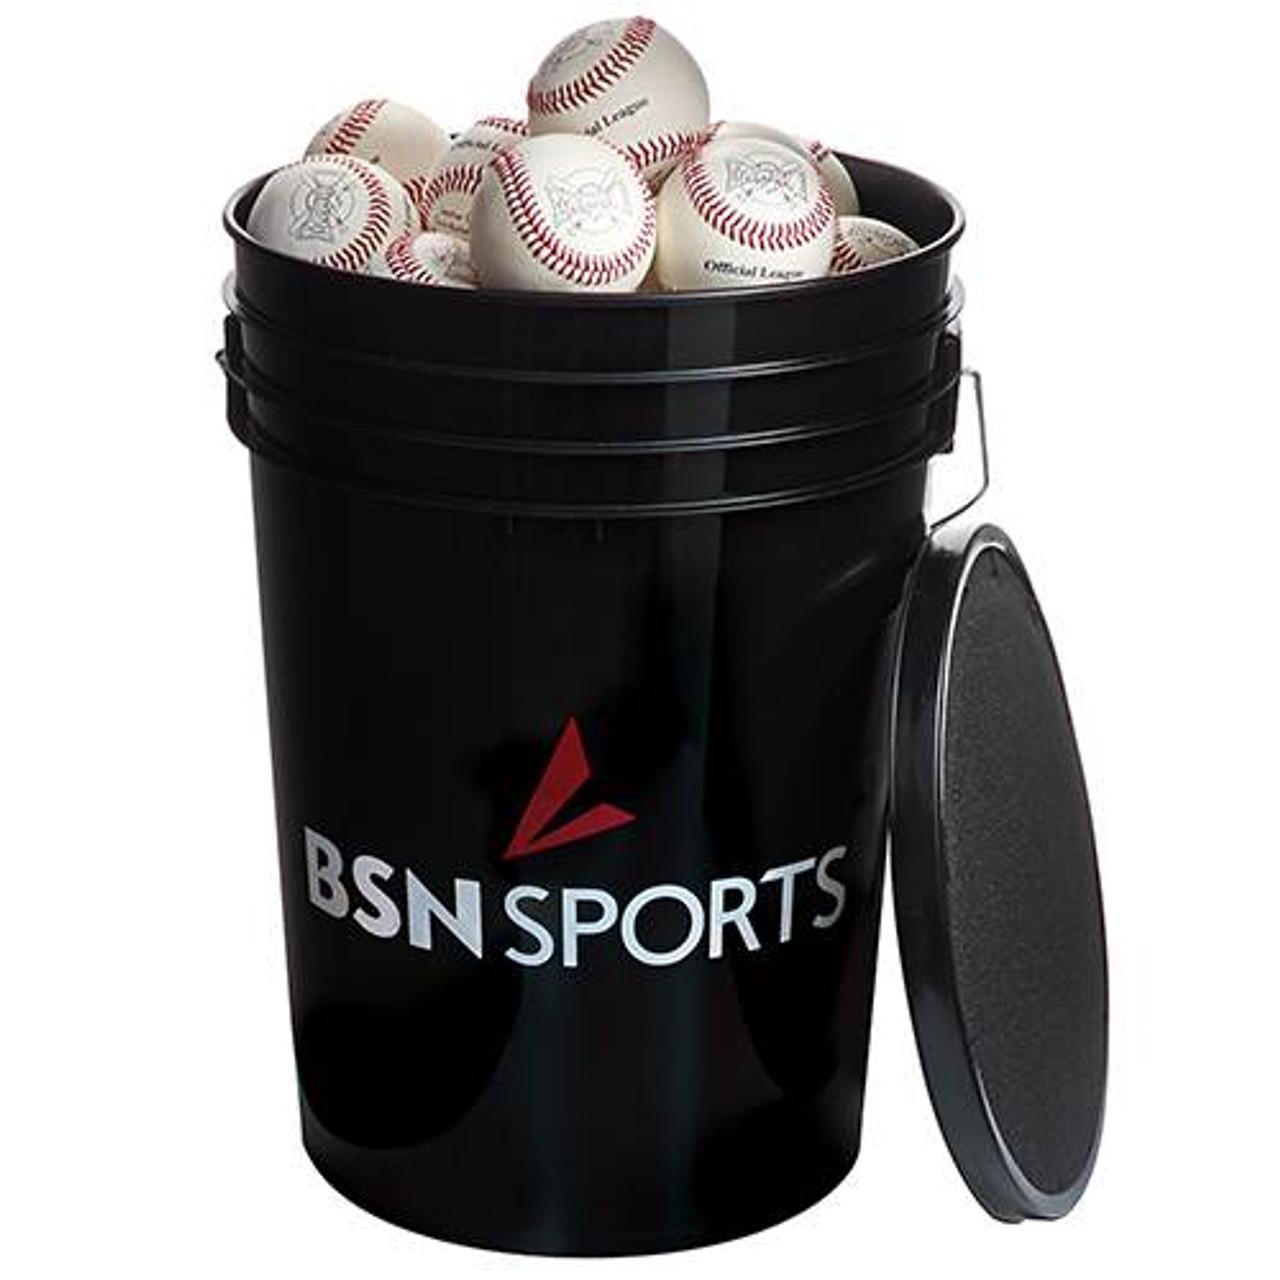 BSN SPORTS  Bucket with 36 Mark 1 Official League Baseballs